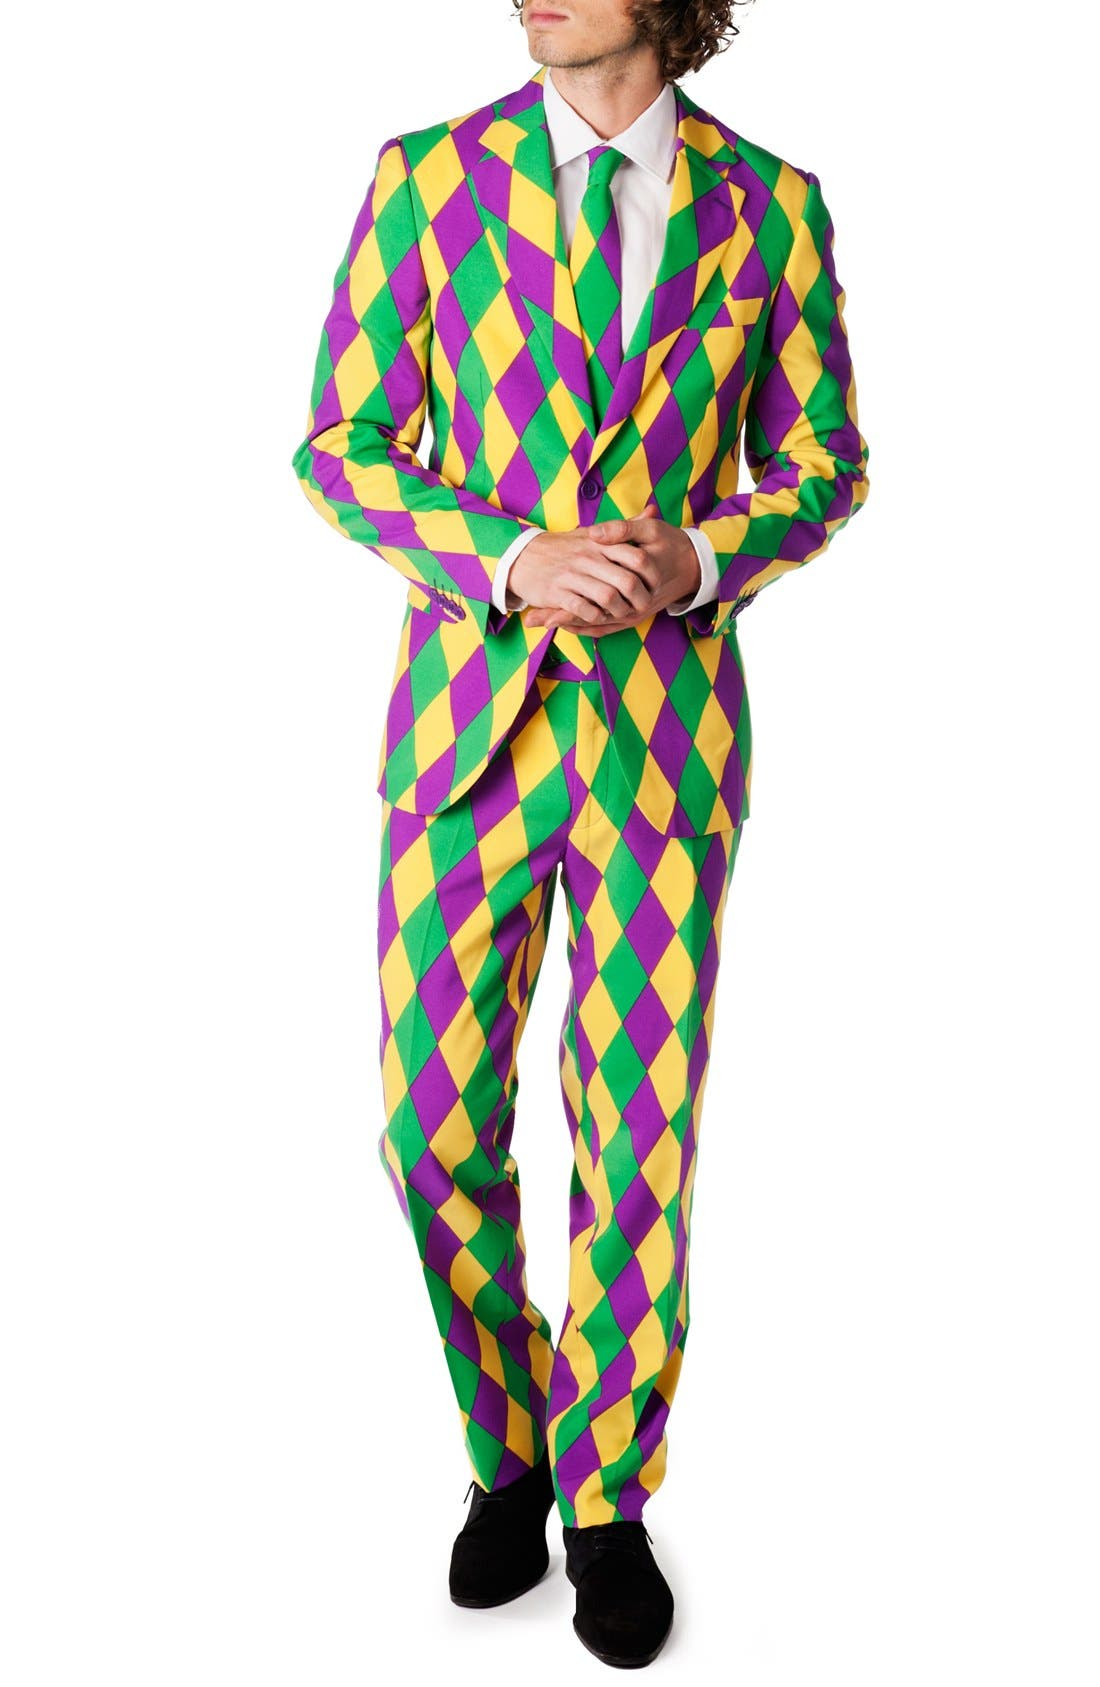 'Harleking' Trim Fit Suit with Tie,                             Main thumbnail 1, color,                             300